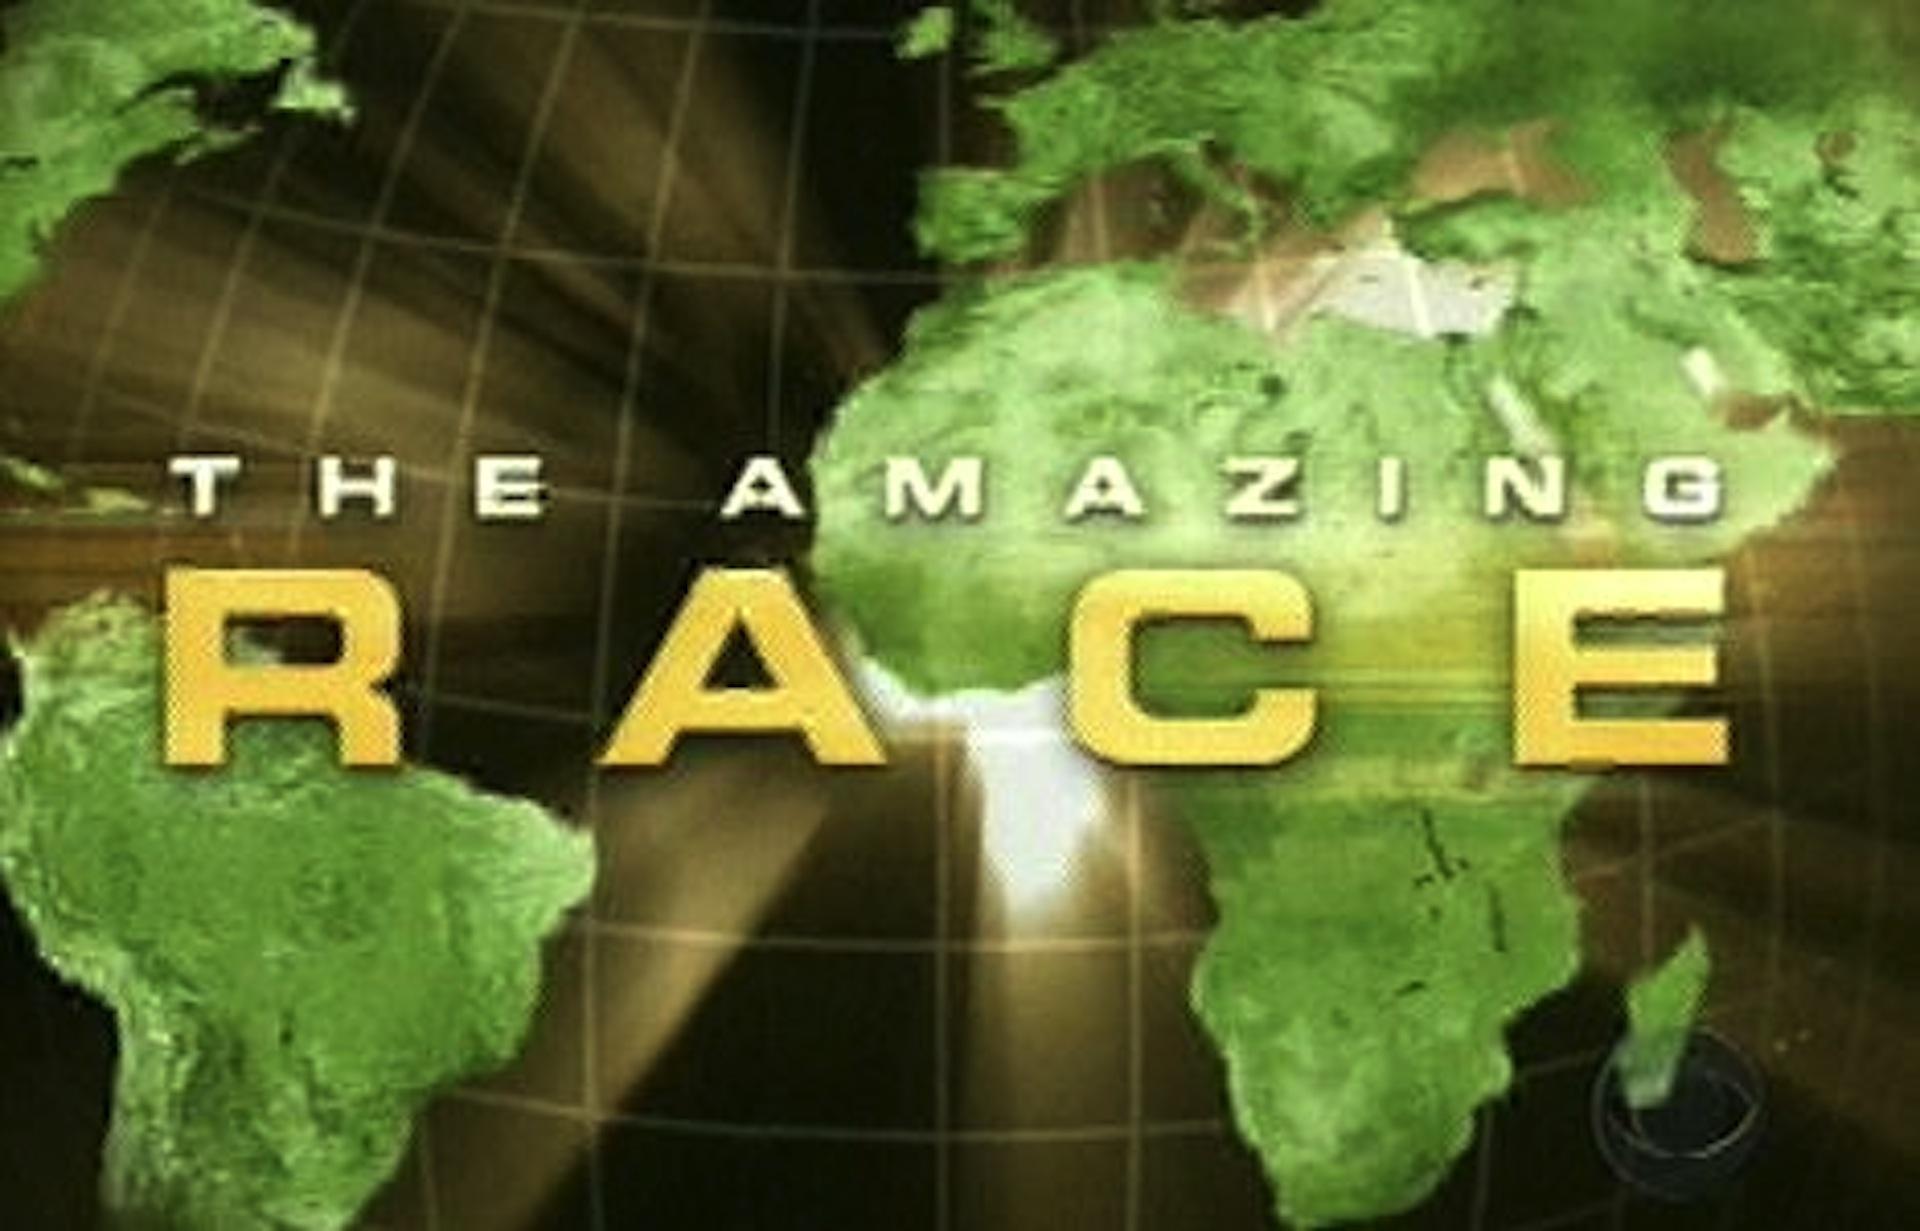 image the amazing race title card 2002 2008 jpg logopedia